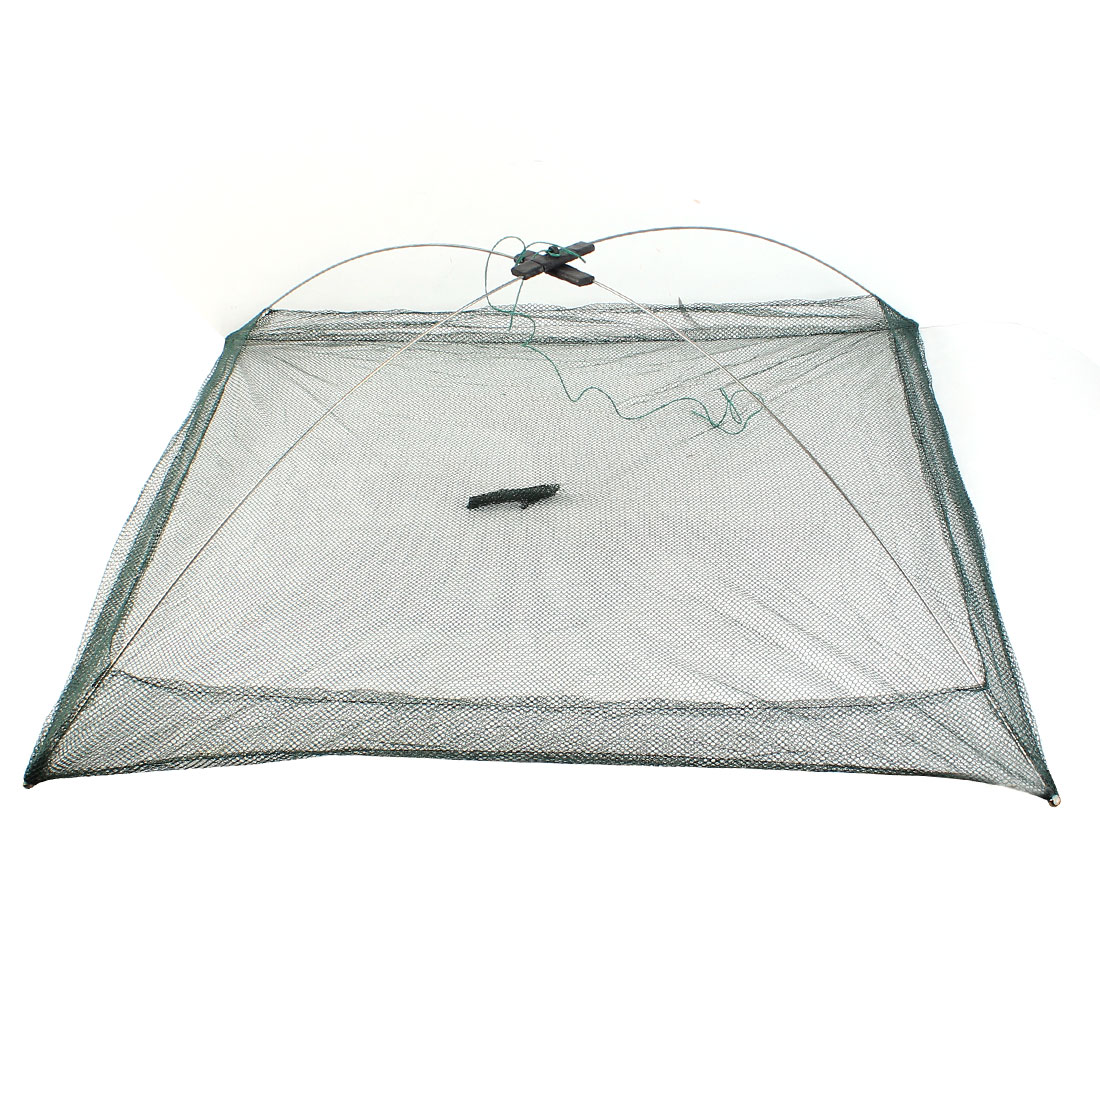 Foldable Fishing Crab Mesh Baits Umbrella Dip Net Dark Green 77cm x 77cm